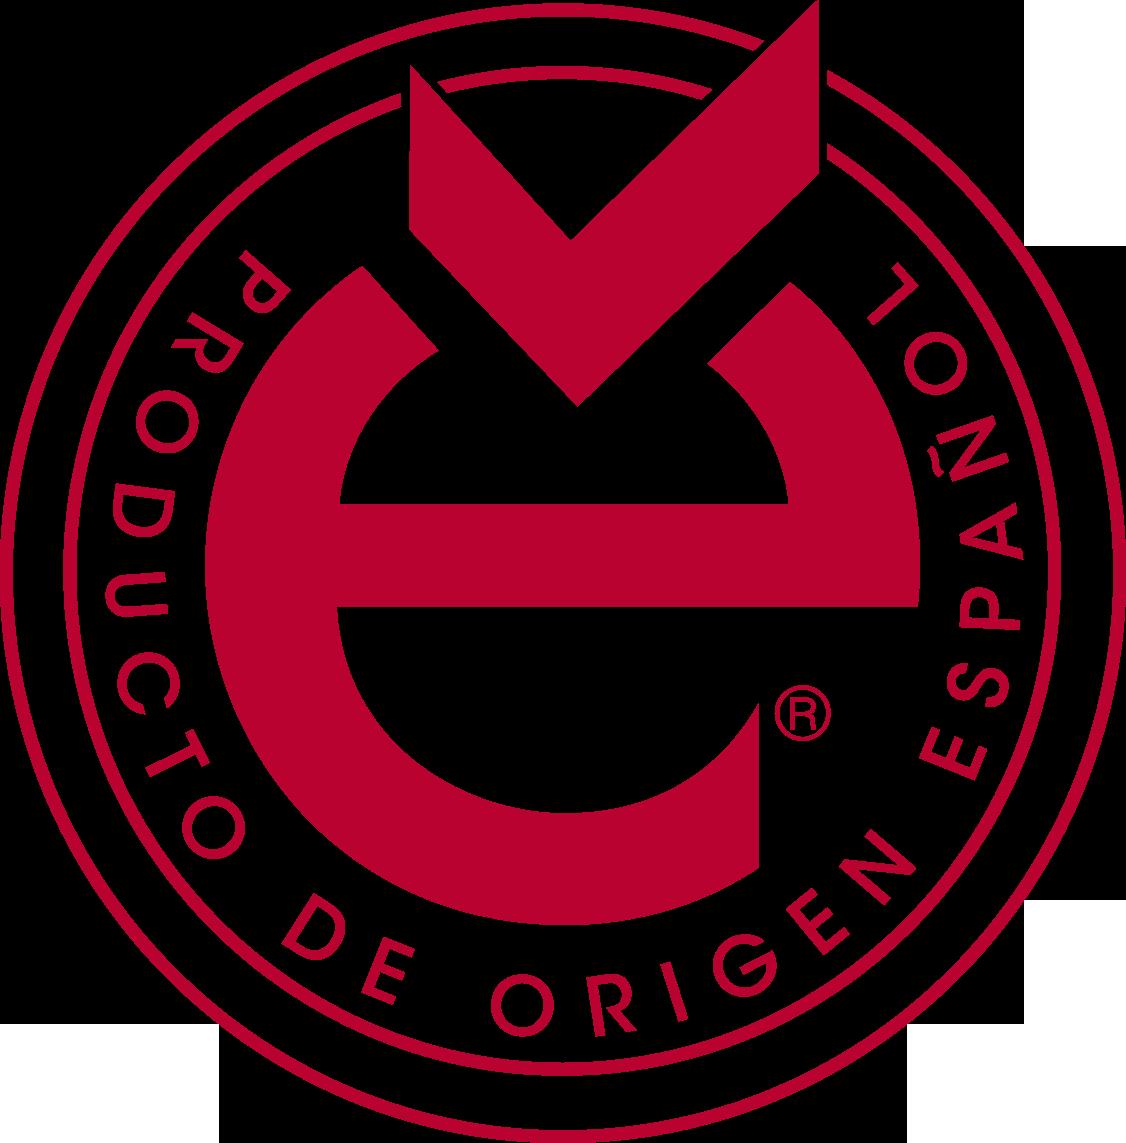 Origen Español